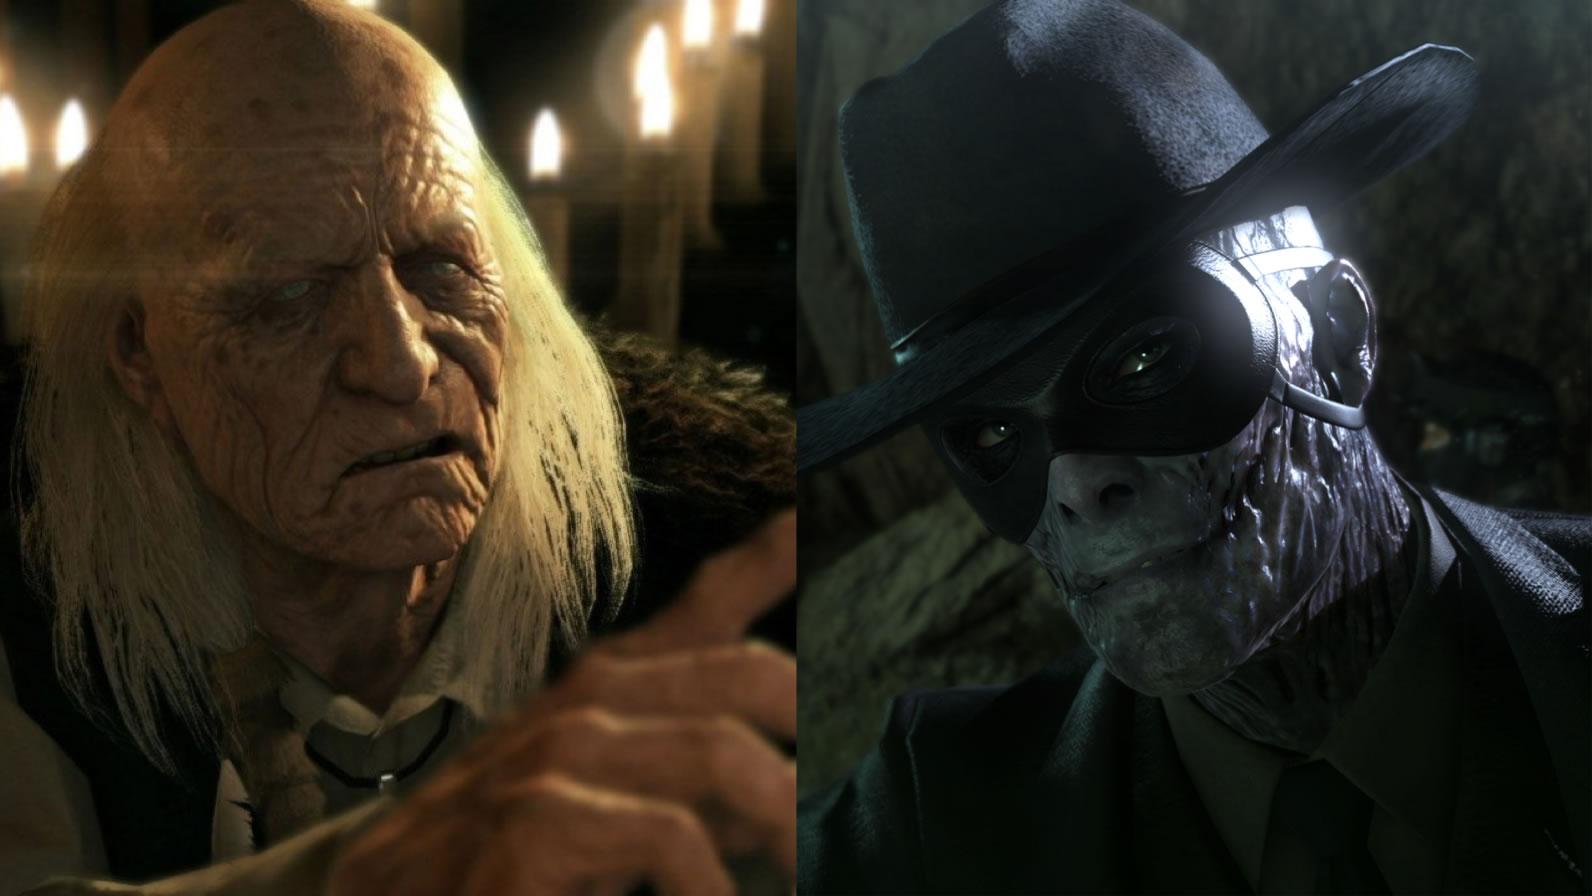 Code Talker et Skullface, pivots du discours de Kojima dans Metal Gear Solid V : The Phantom Pain (2015)